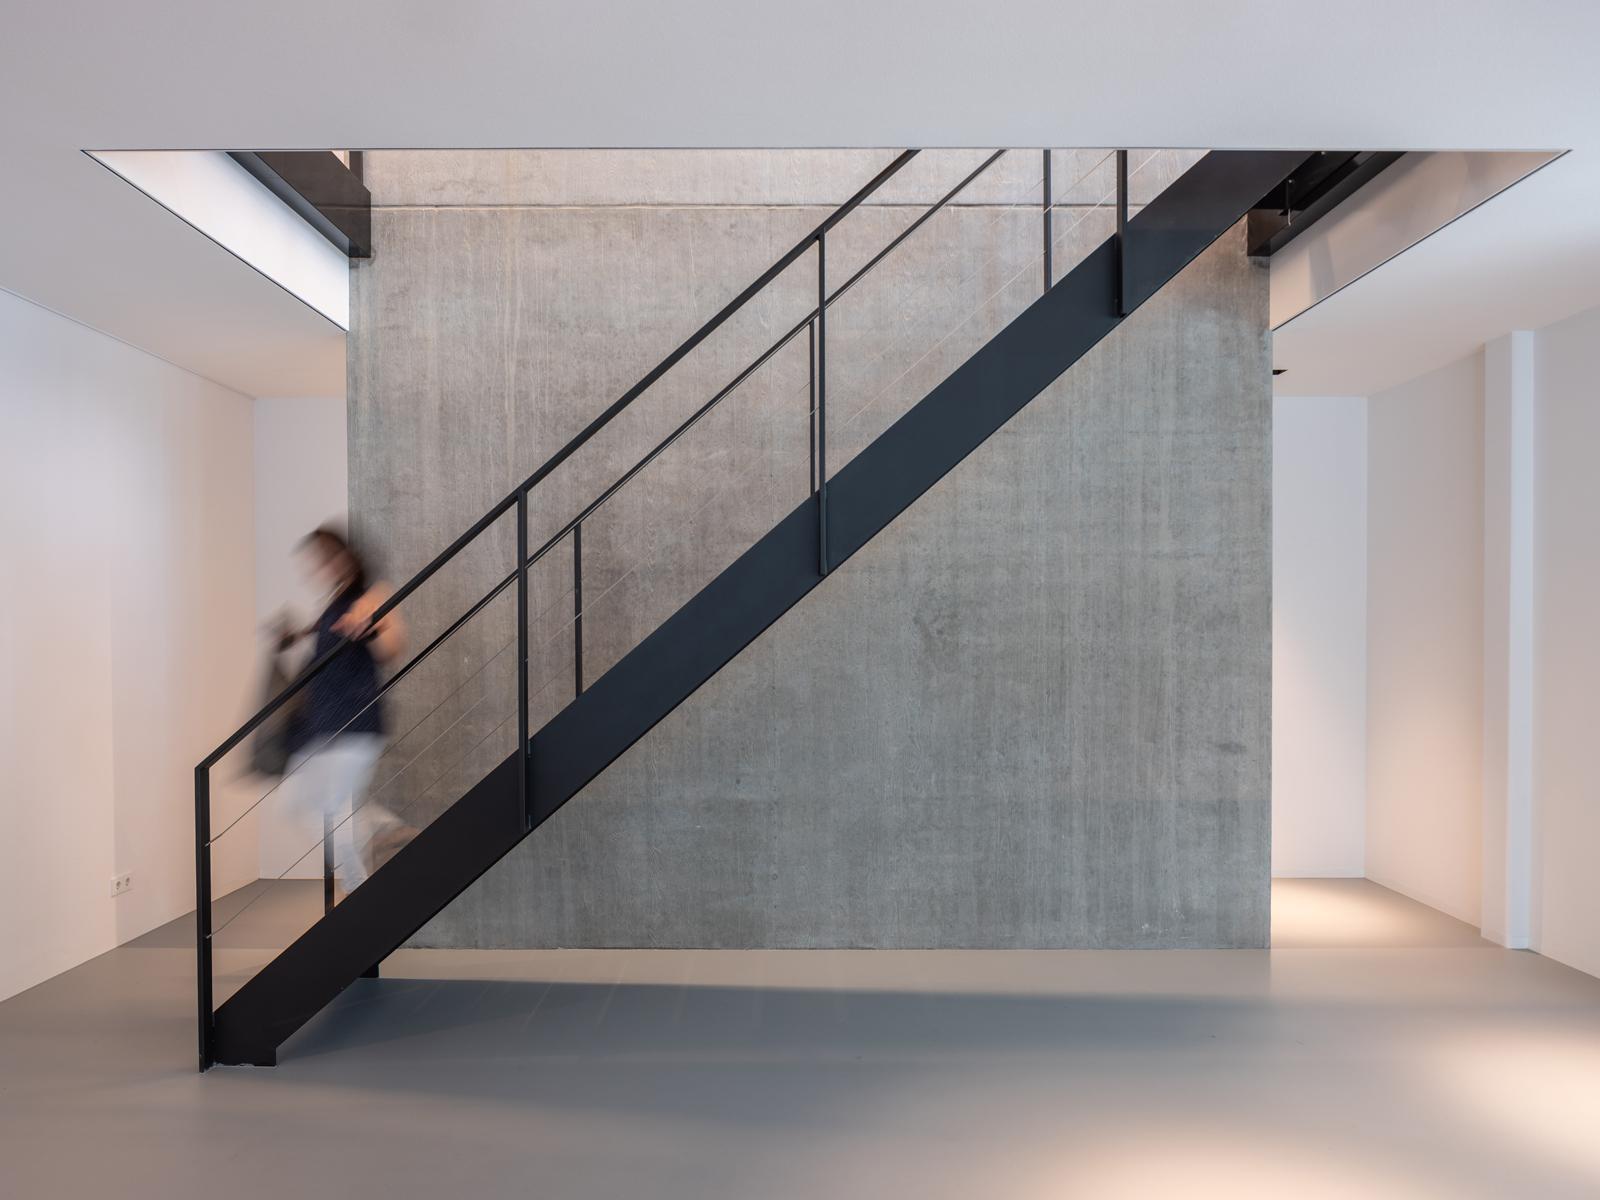 Bureau for architecture and urbanism delva landscape architecture